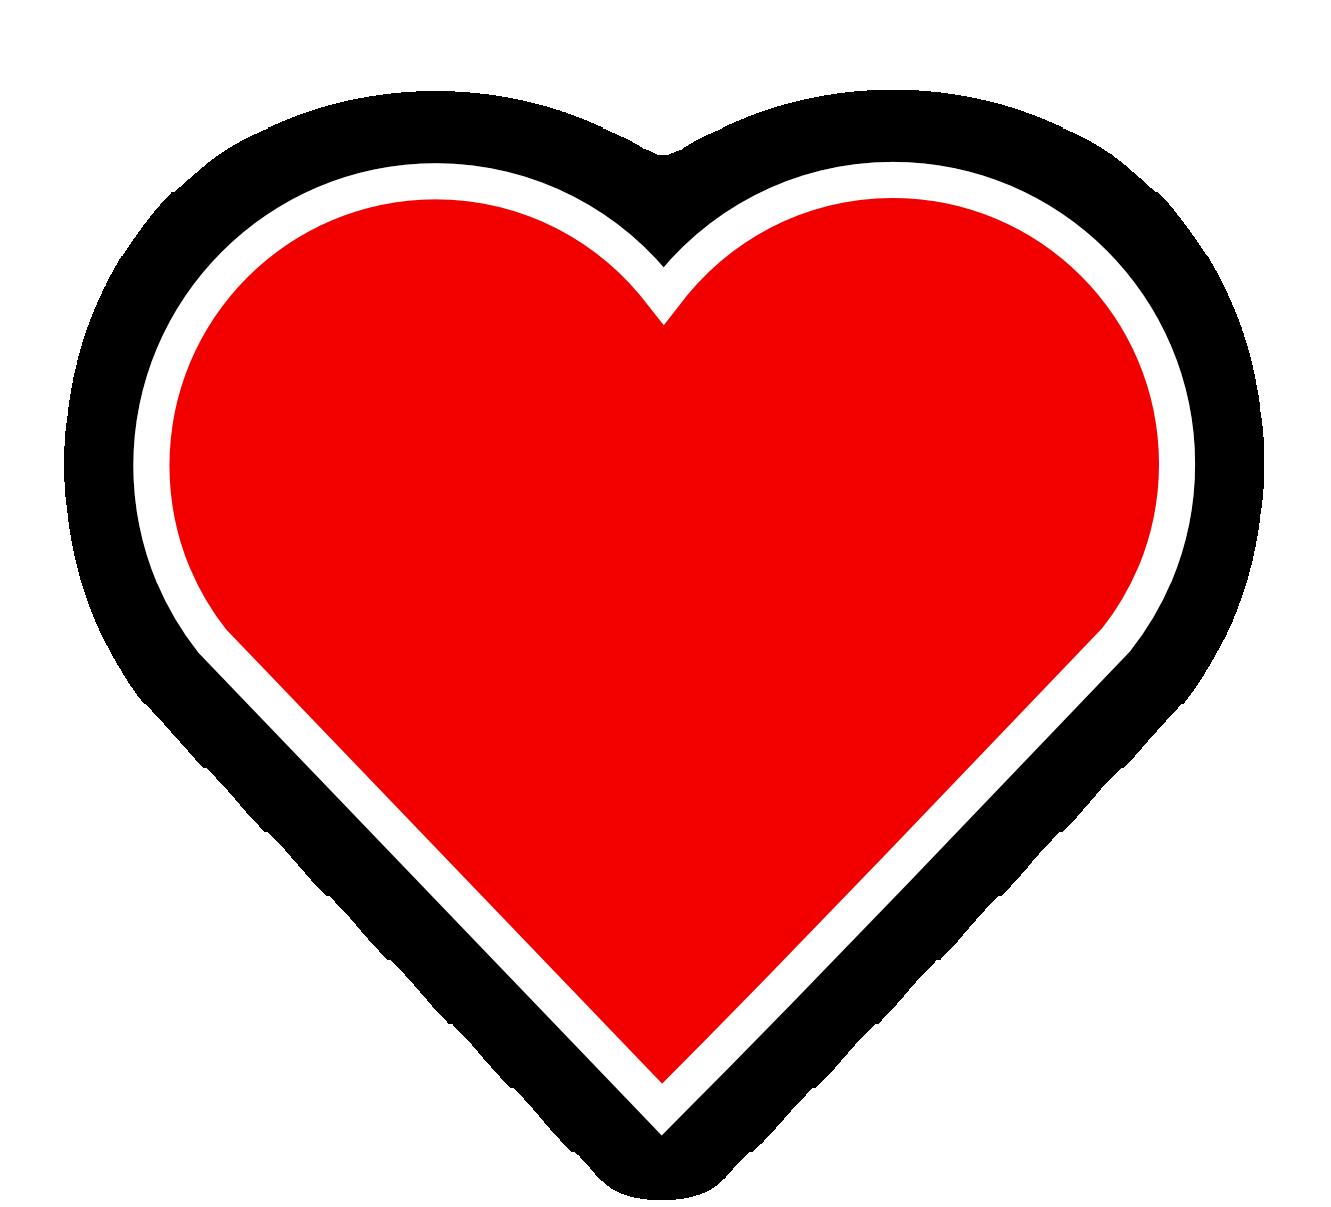 Funky heart clipart jpg transparent stock Heart Png With Border jpg transparent stock